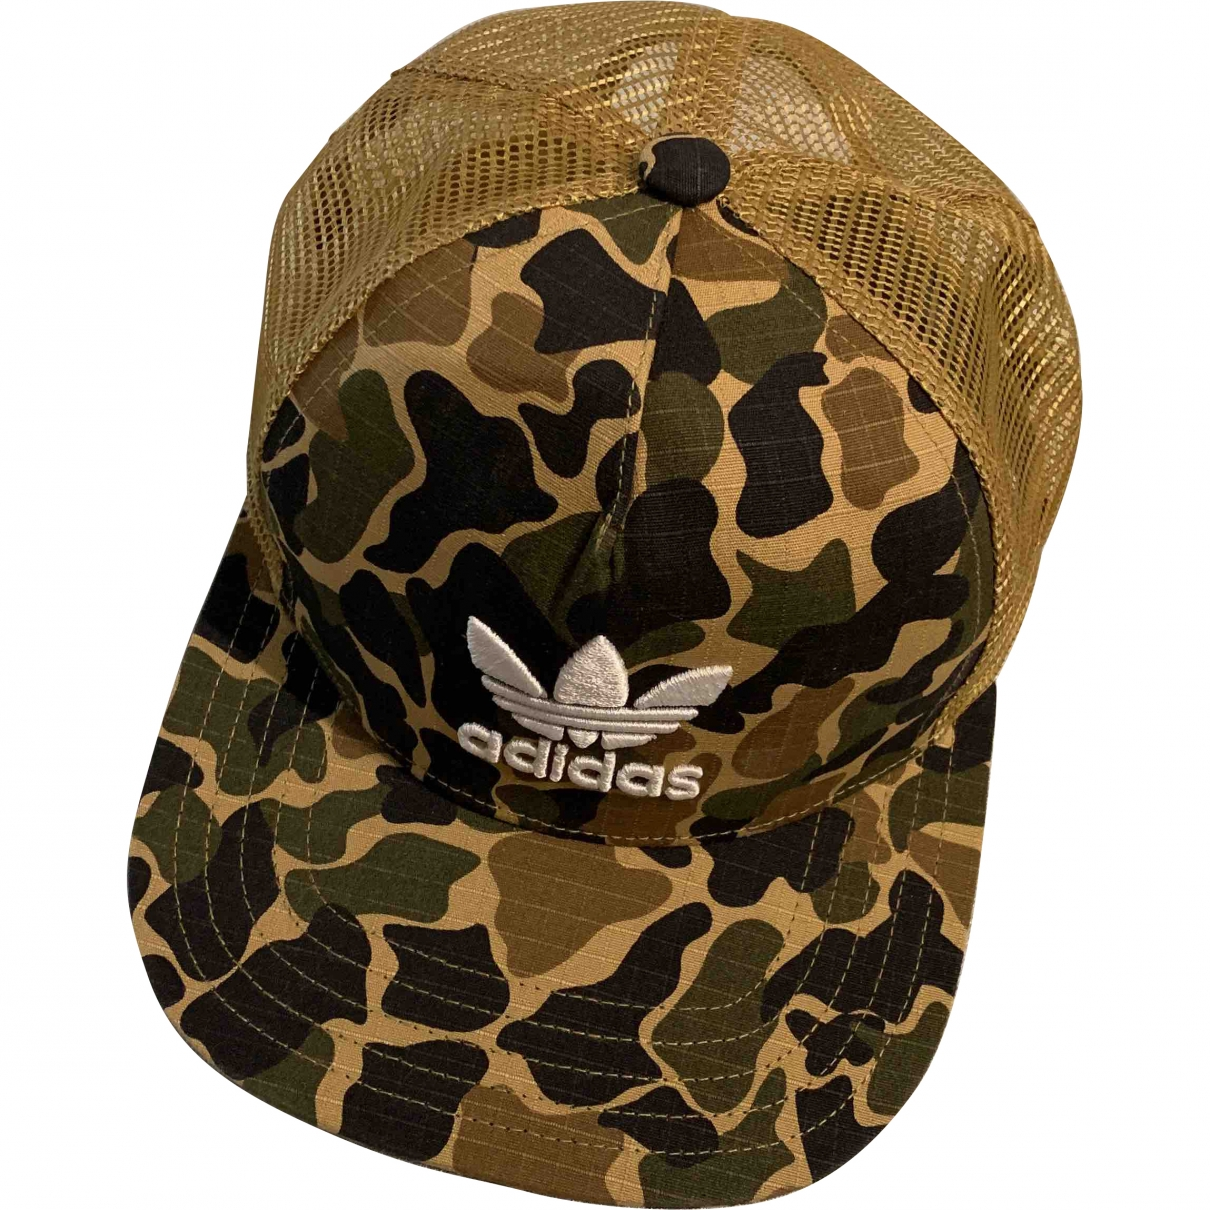 Adidas \N Khaki Cotton hat for Women M International